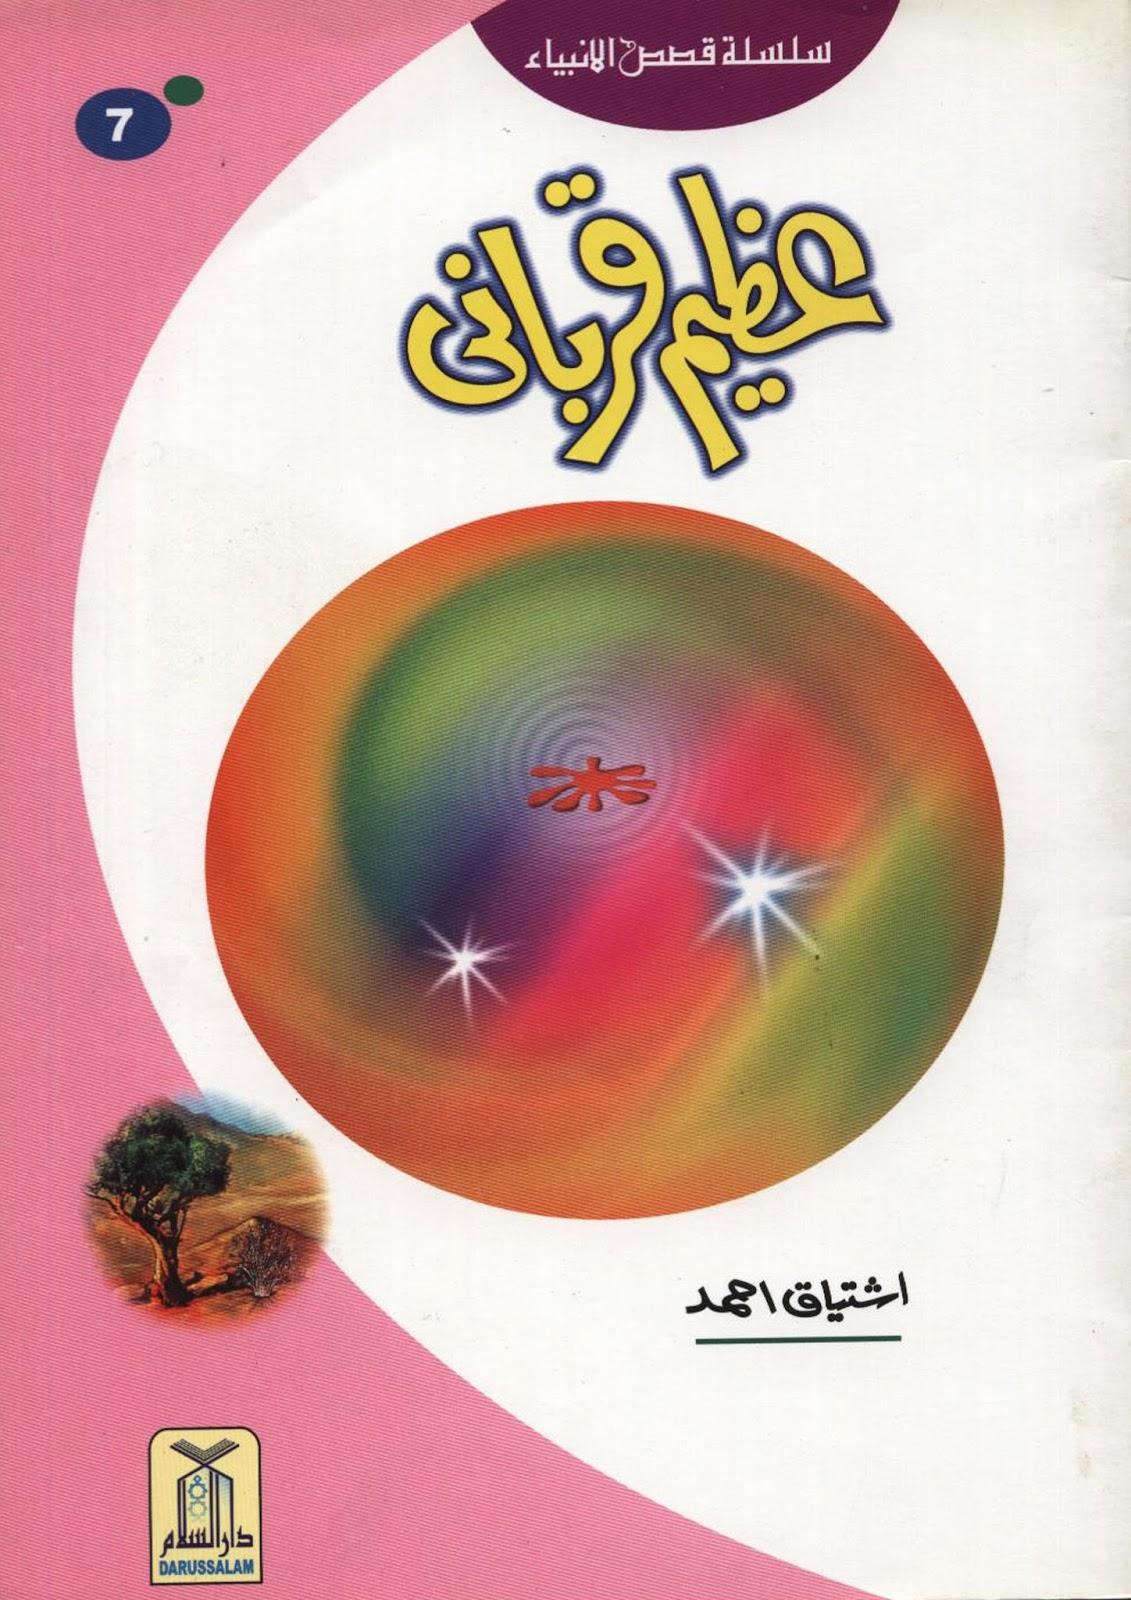 http://urduguru1.blogspot.com/2014/03/azeem-qurbani-prophet-ismail-as.html